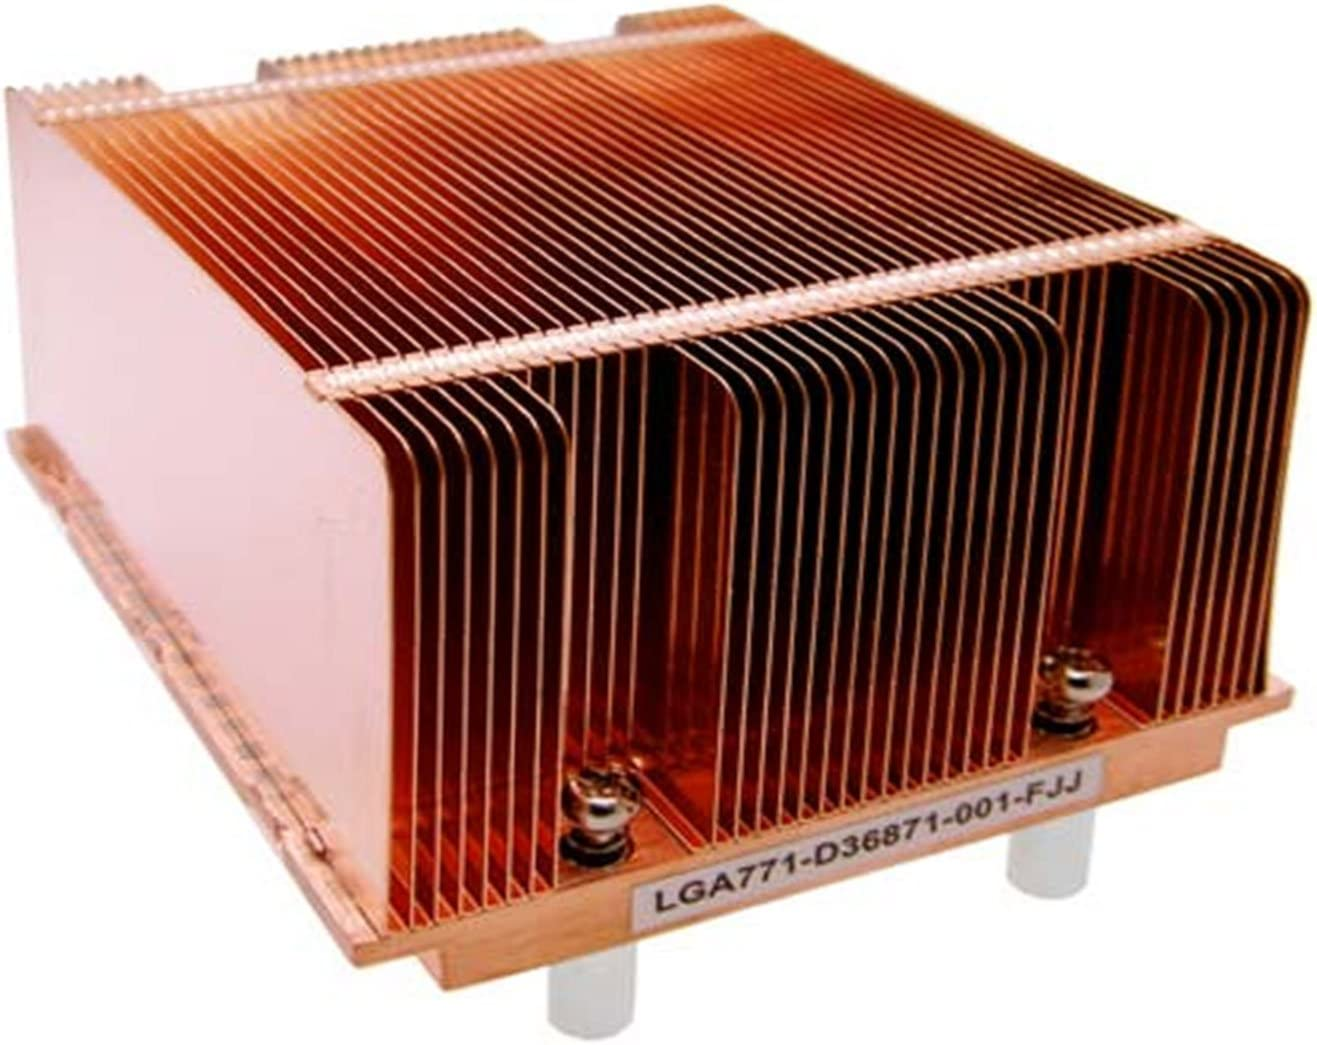 D36871-001 Original Intel Xeon 2U Passive Heatsink for Socket LGA771